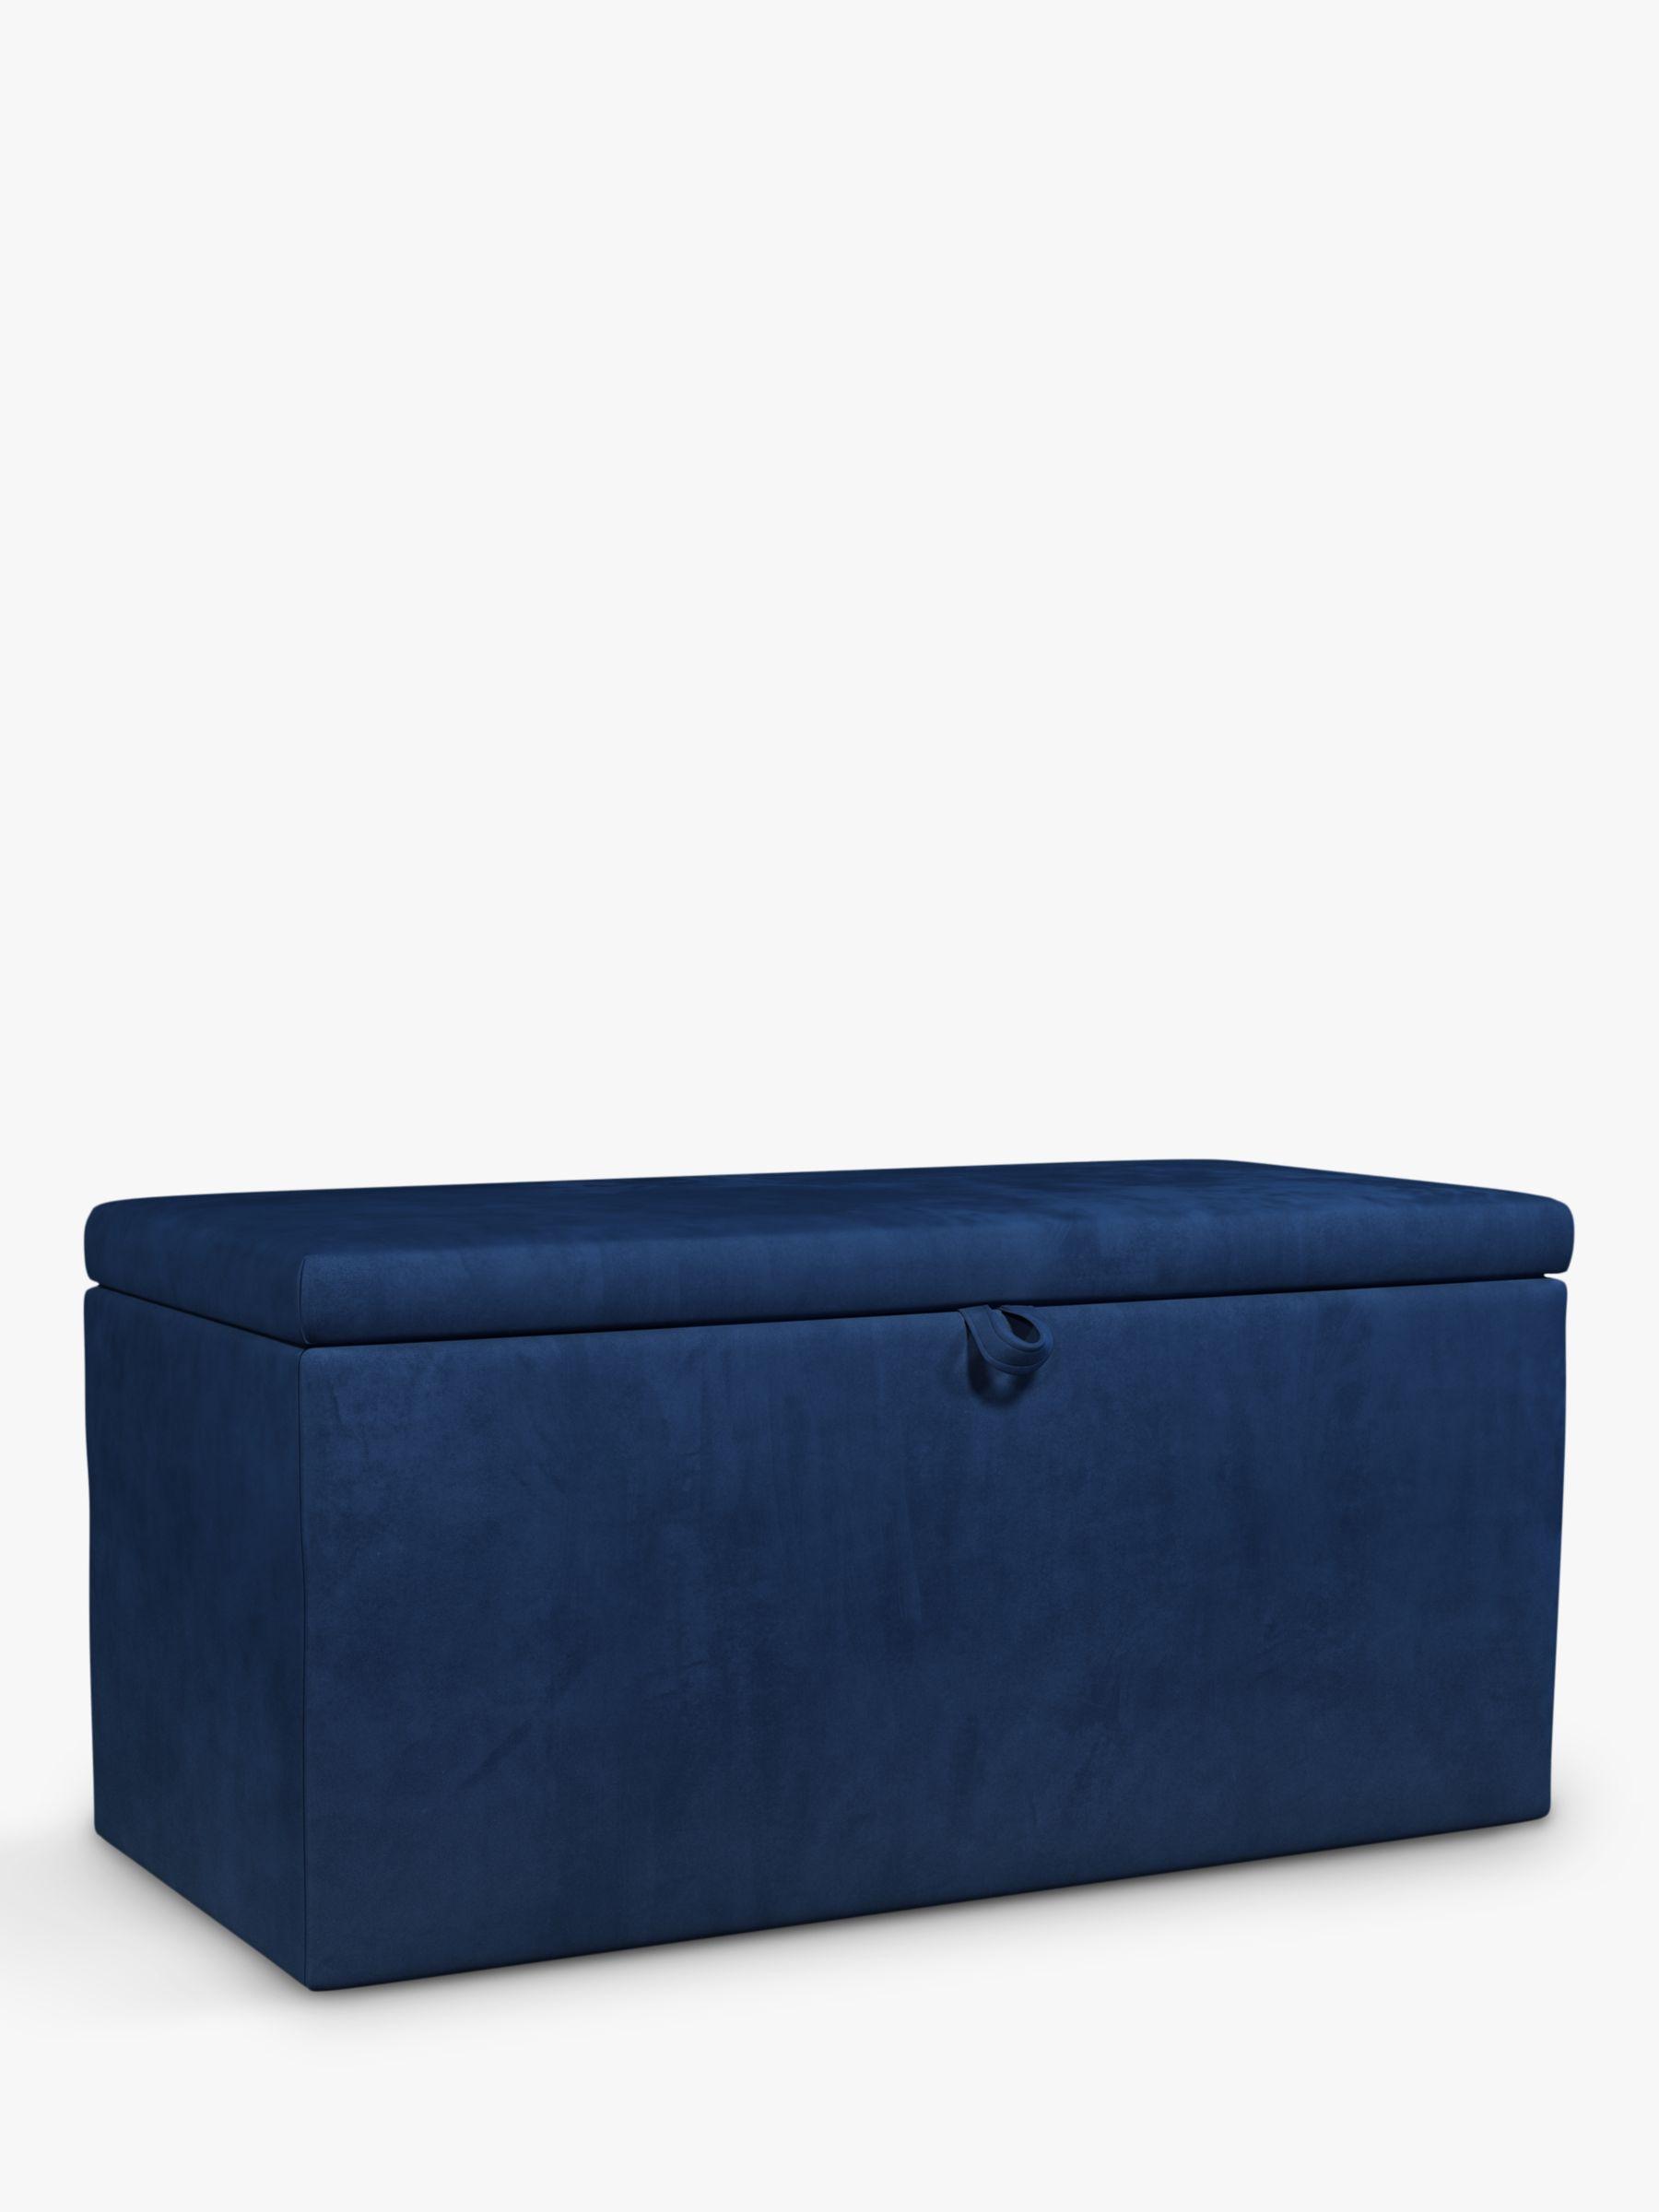 John Lewis & Partners Emily Upholstered Ottoman Storage Box